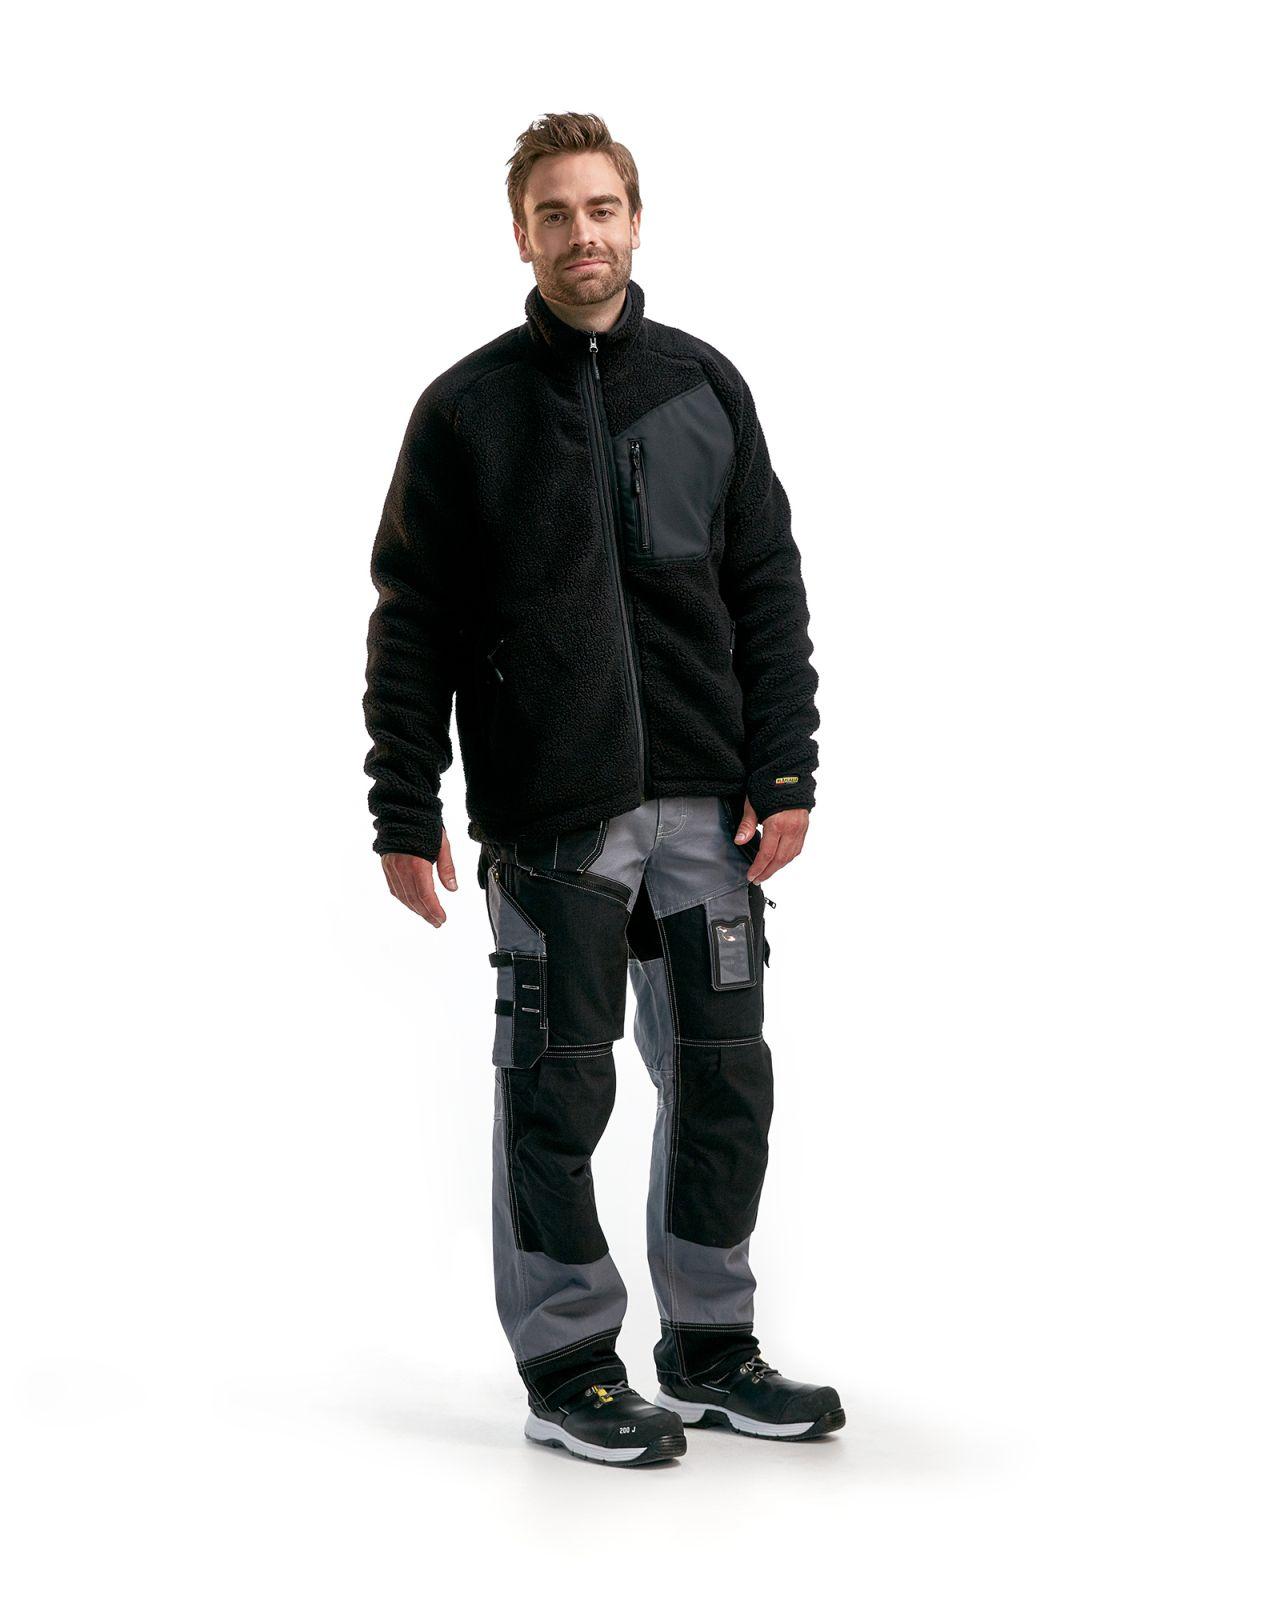 Blaklader Fleece vesten 48292505 zwart(9900)